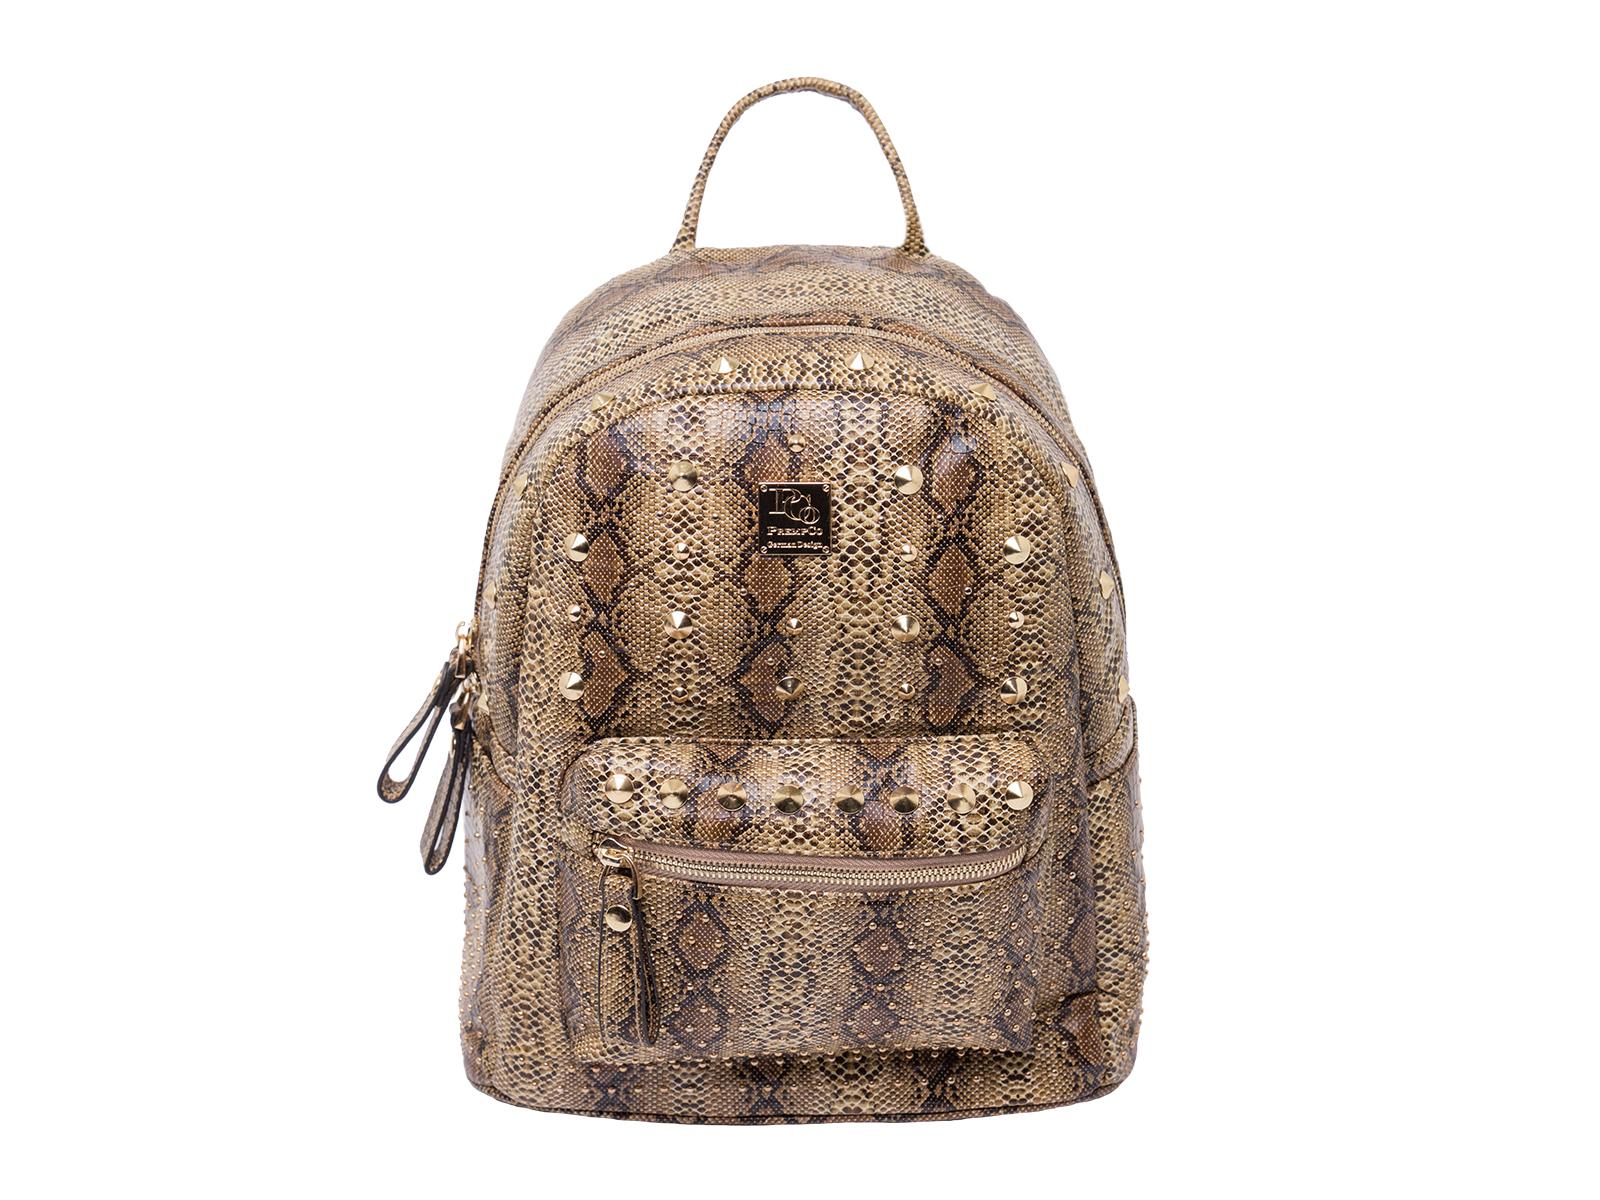 PCo Viper damen rucksack braun Designer Rucksack Luxus